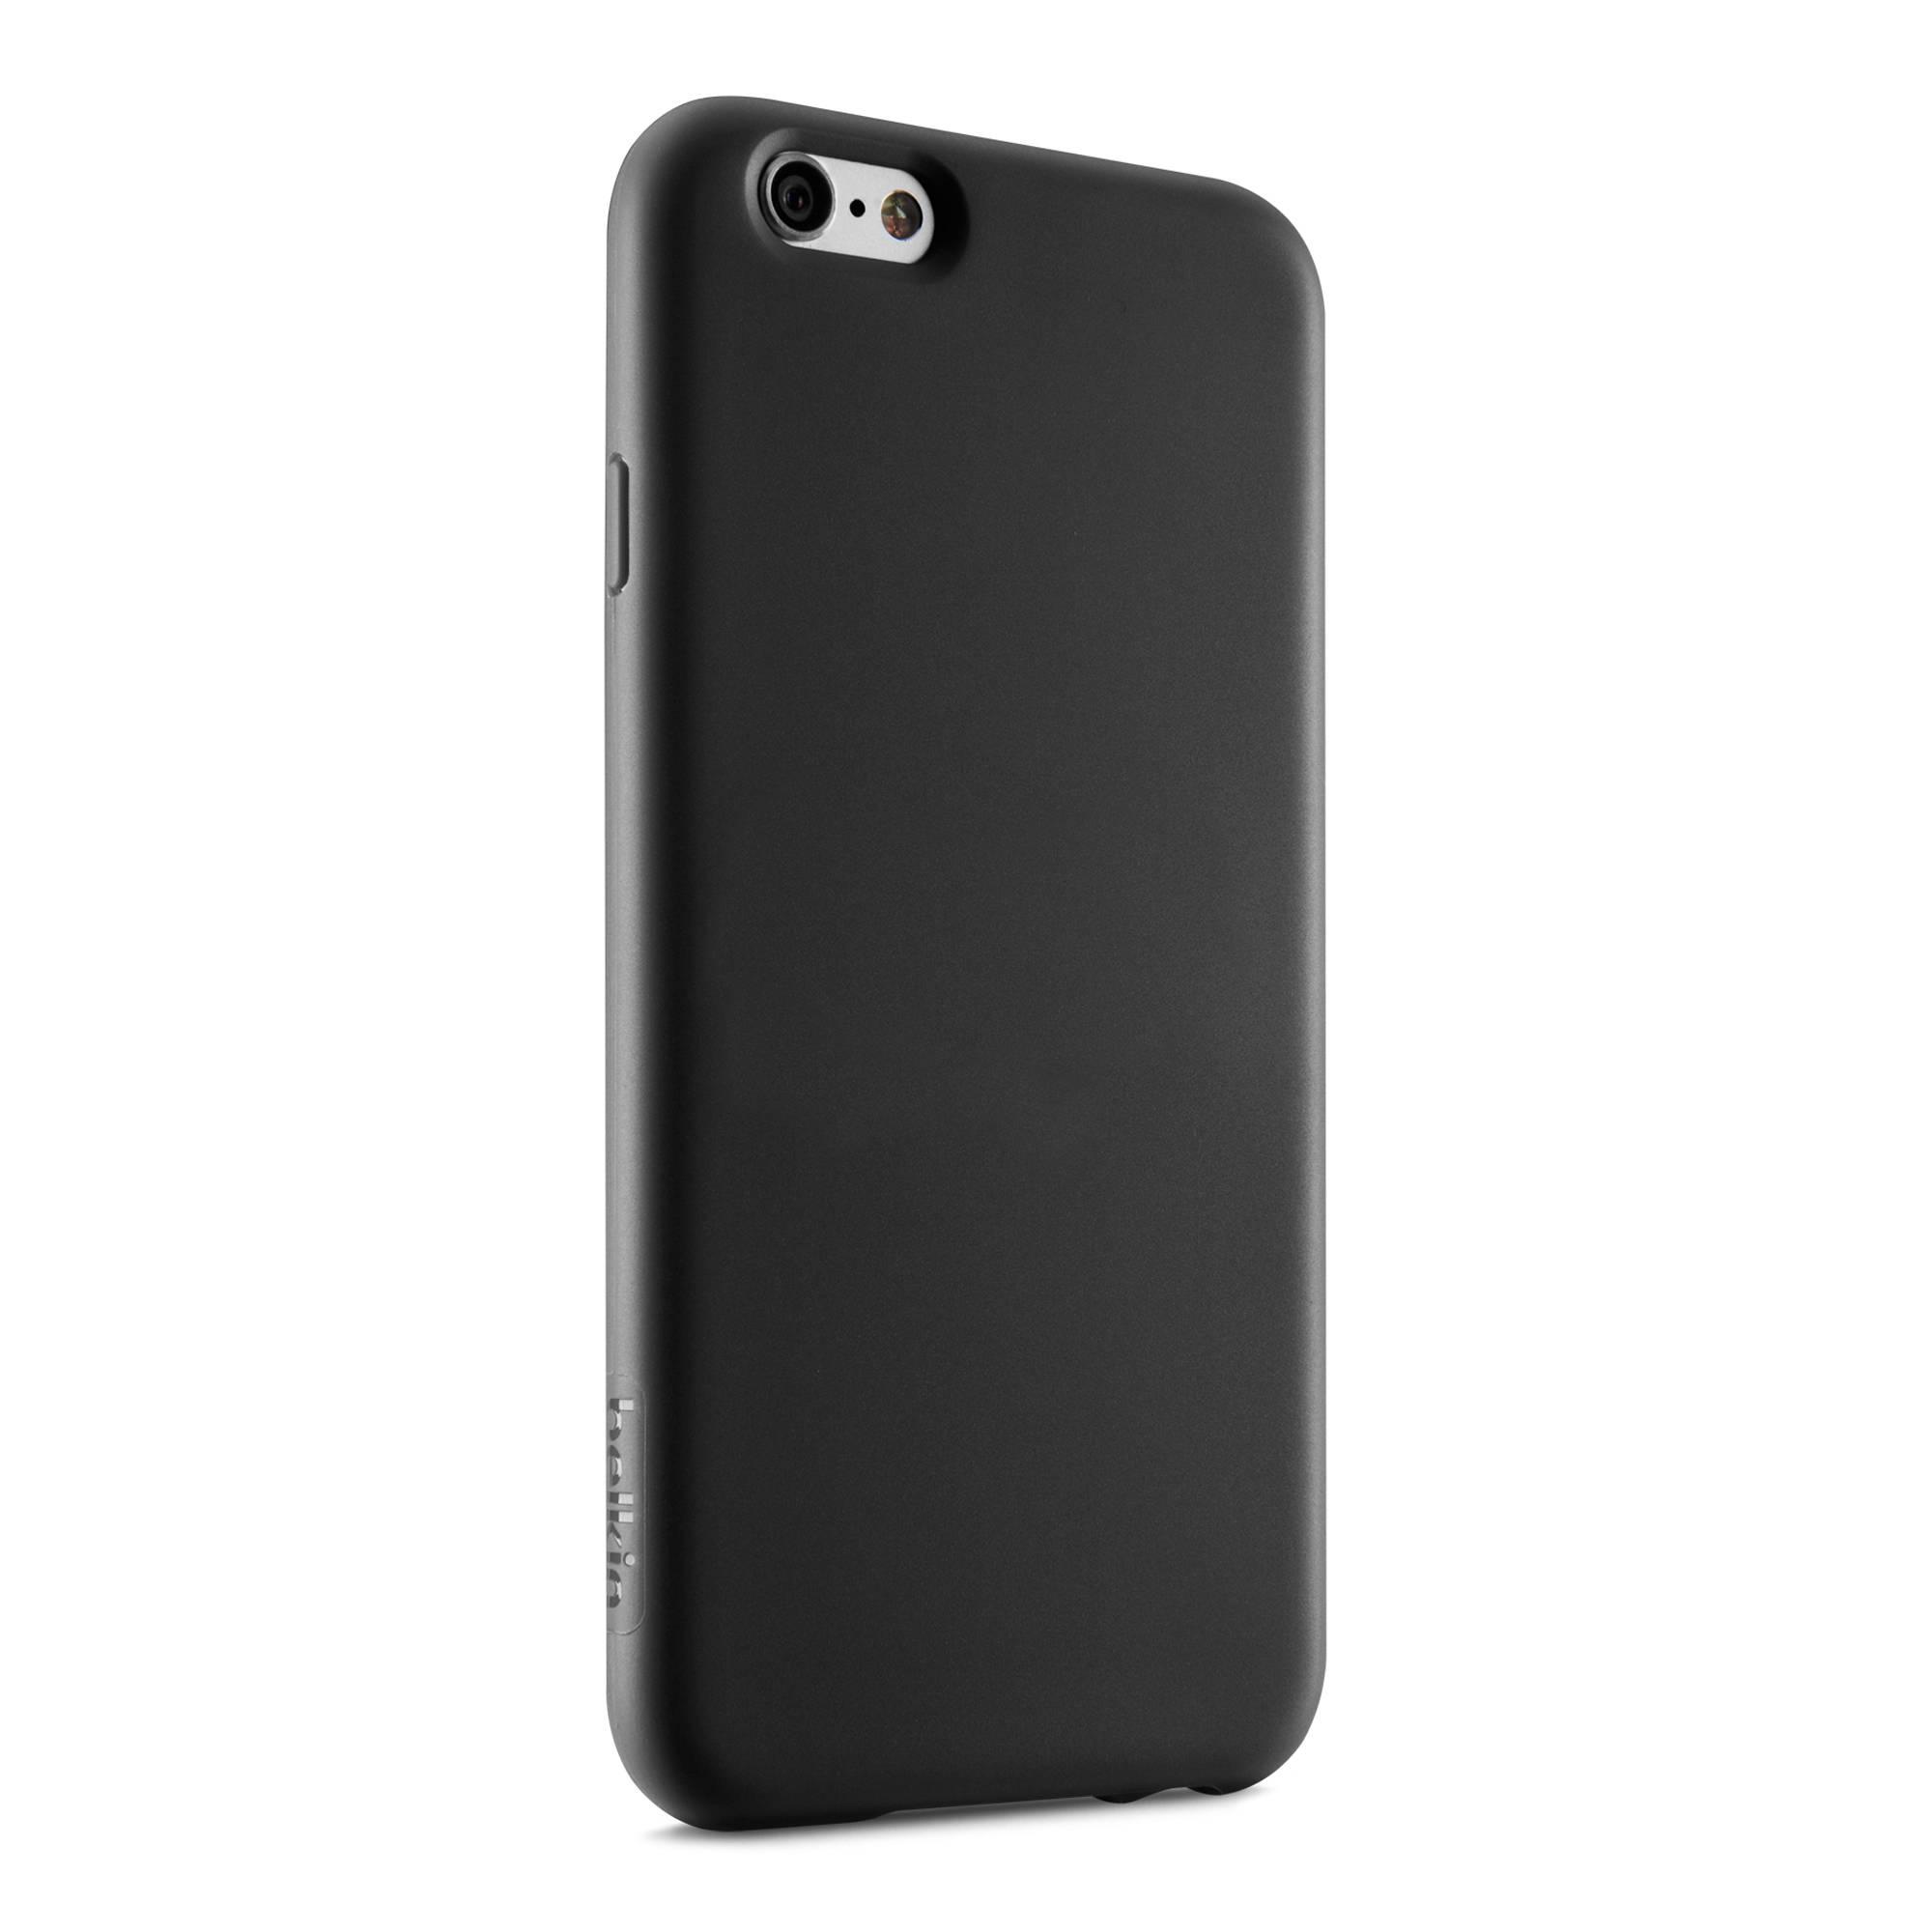 belkin grip case for iphone 6 6s black f8w604btc00 b h photo. Black Bedroom Furniture Sets. Home Design Ideas